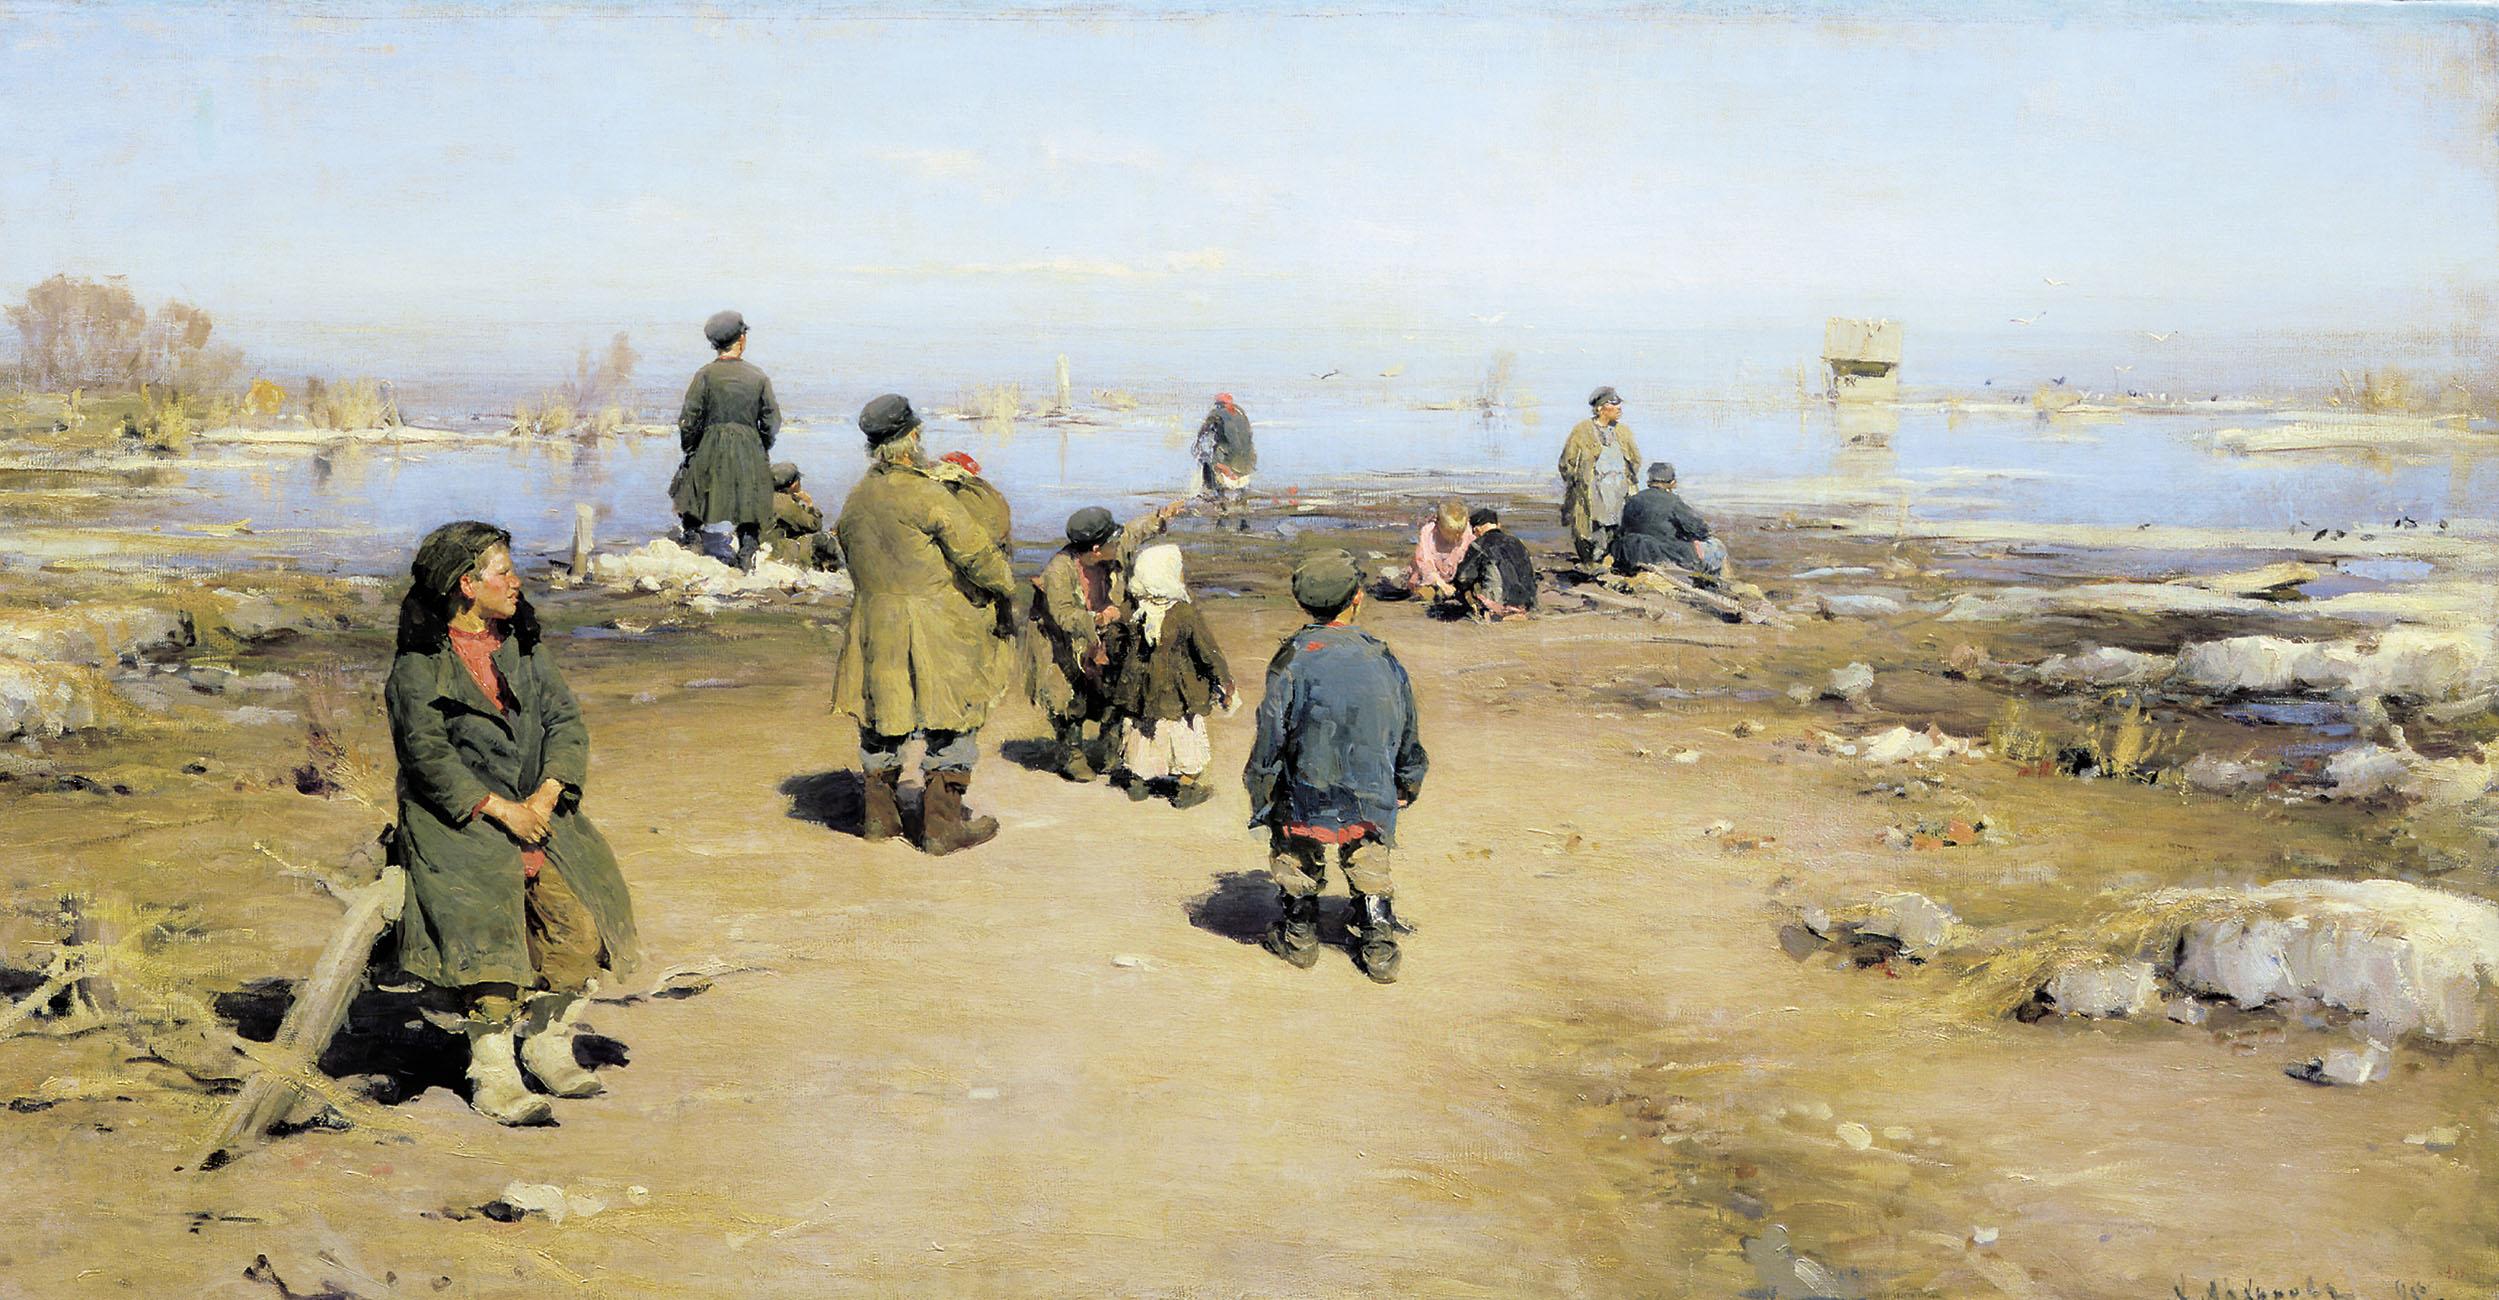 Архипов Абрам картина Лед прошел весенний пейзаж холст масло